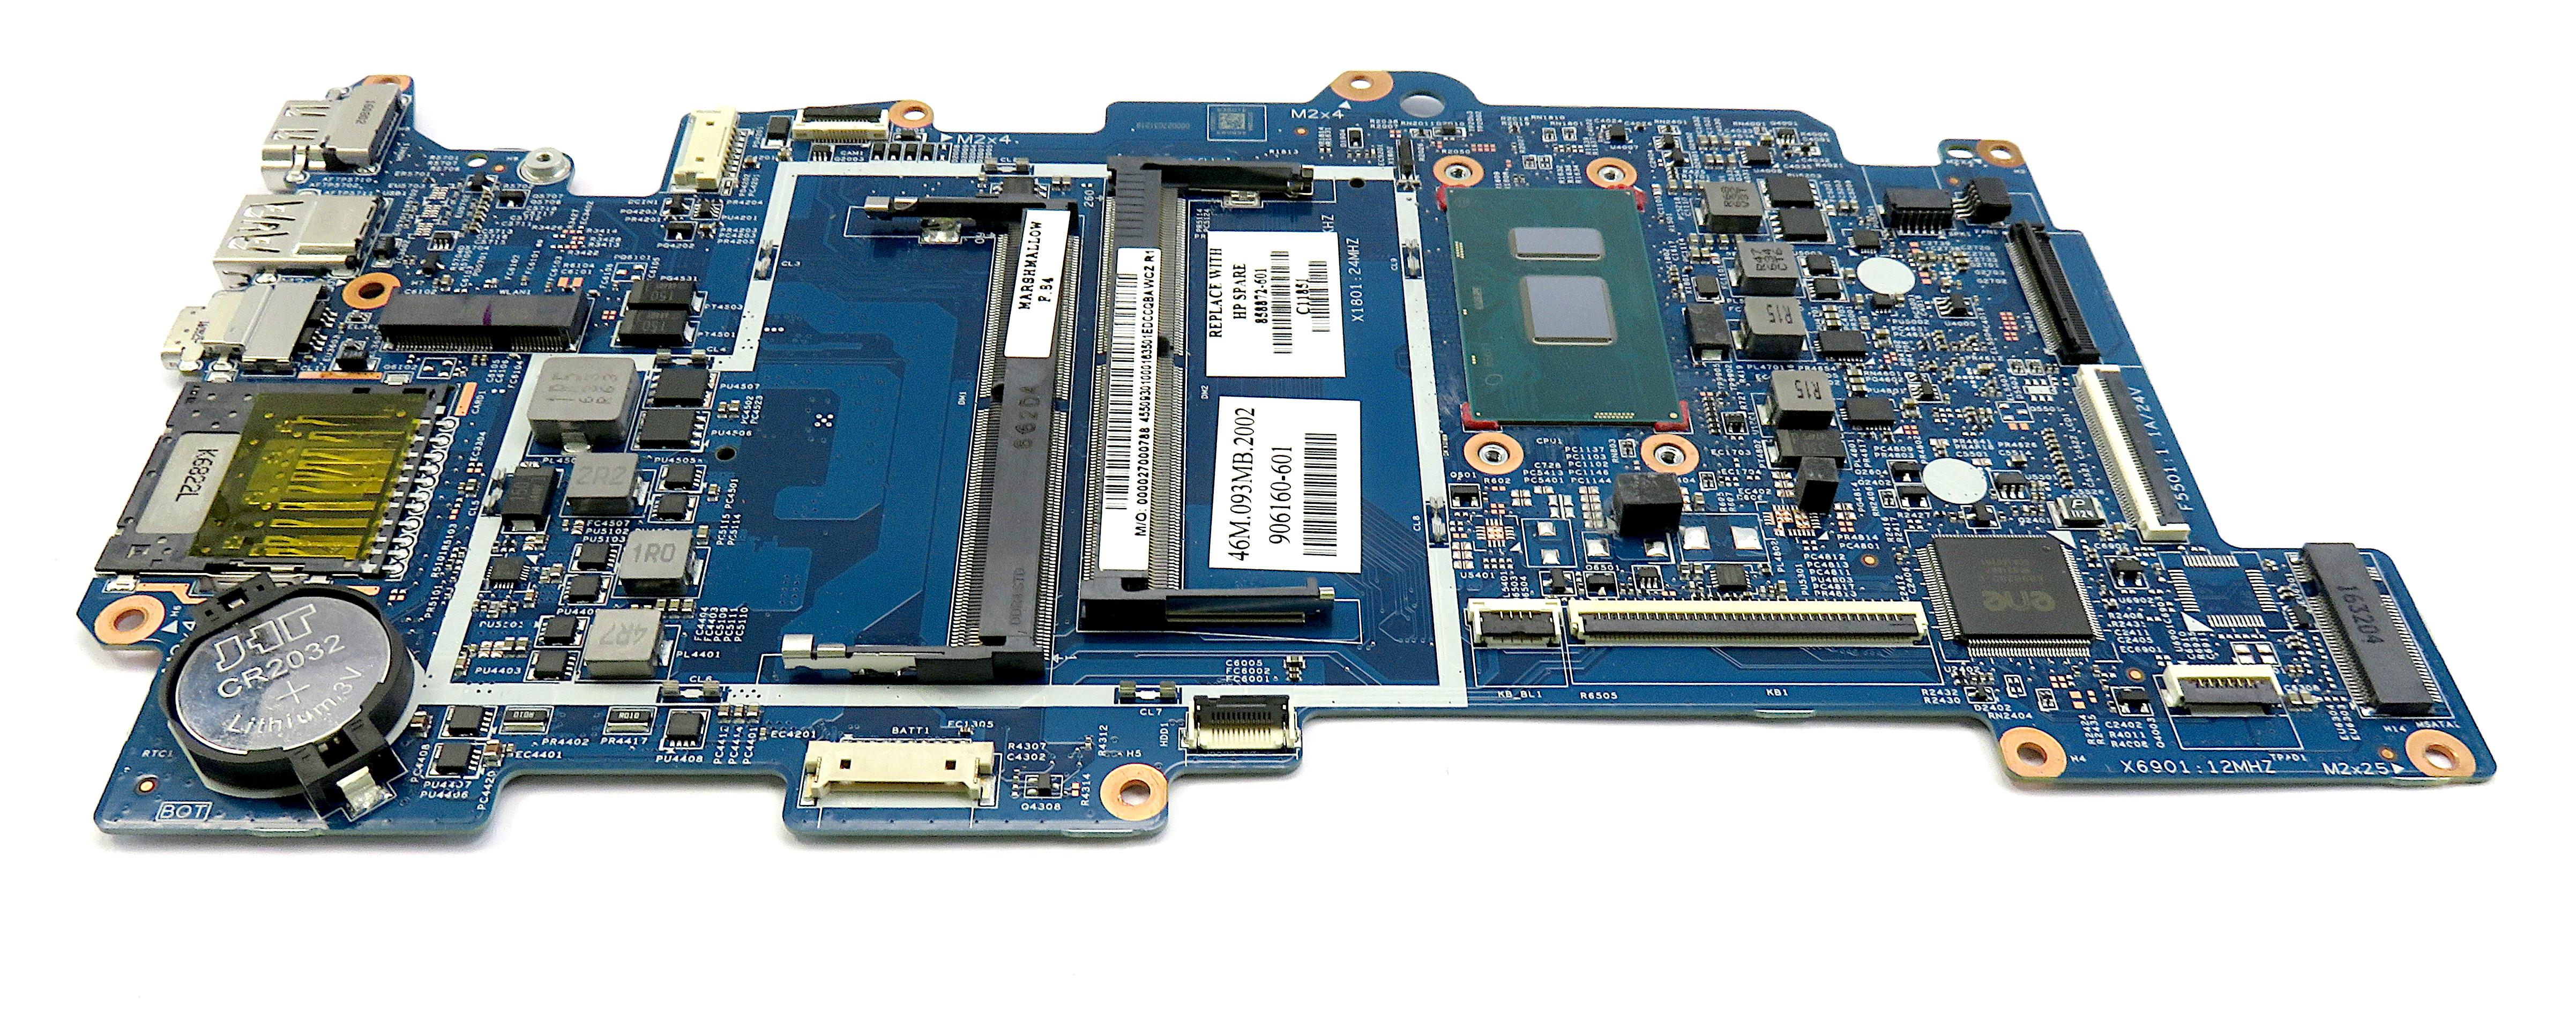 HP ENVY x360 M6-AQ Laptop Motherboard w/ Intel i5-7200U 2.5Ghz CPU - 858872-601